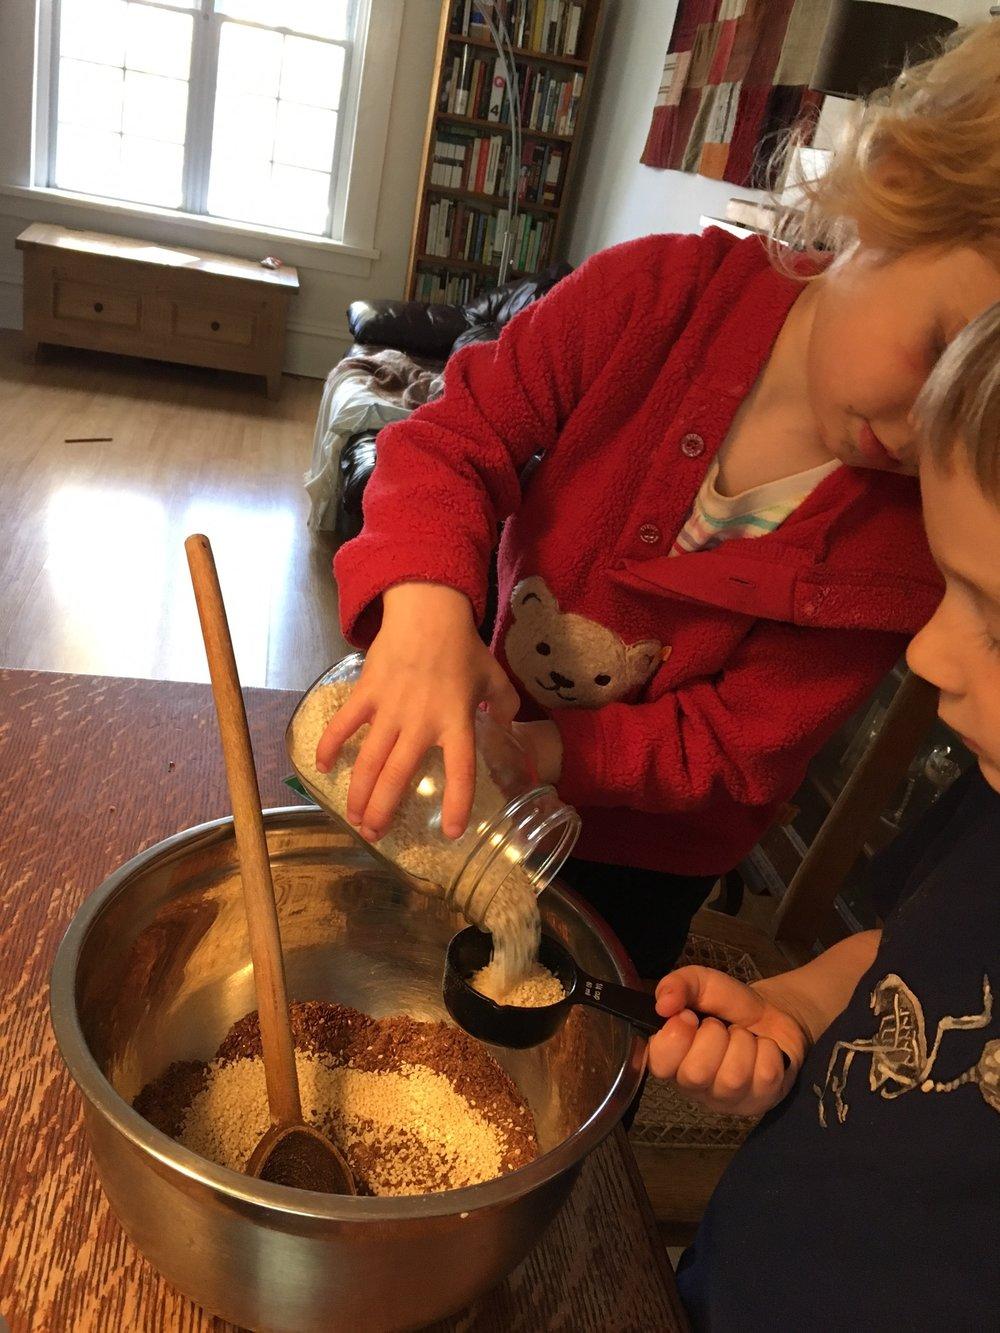 Carefully measuring sesame seeds